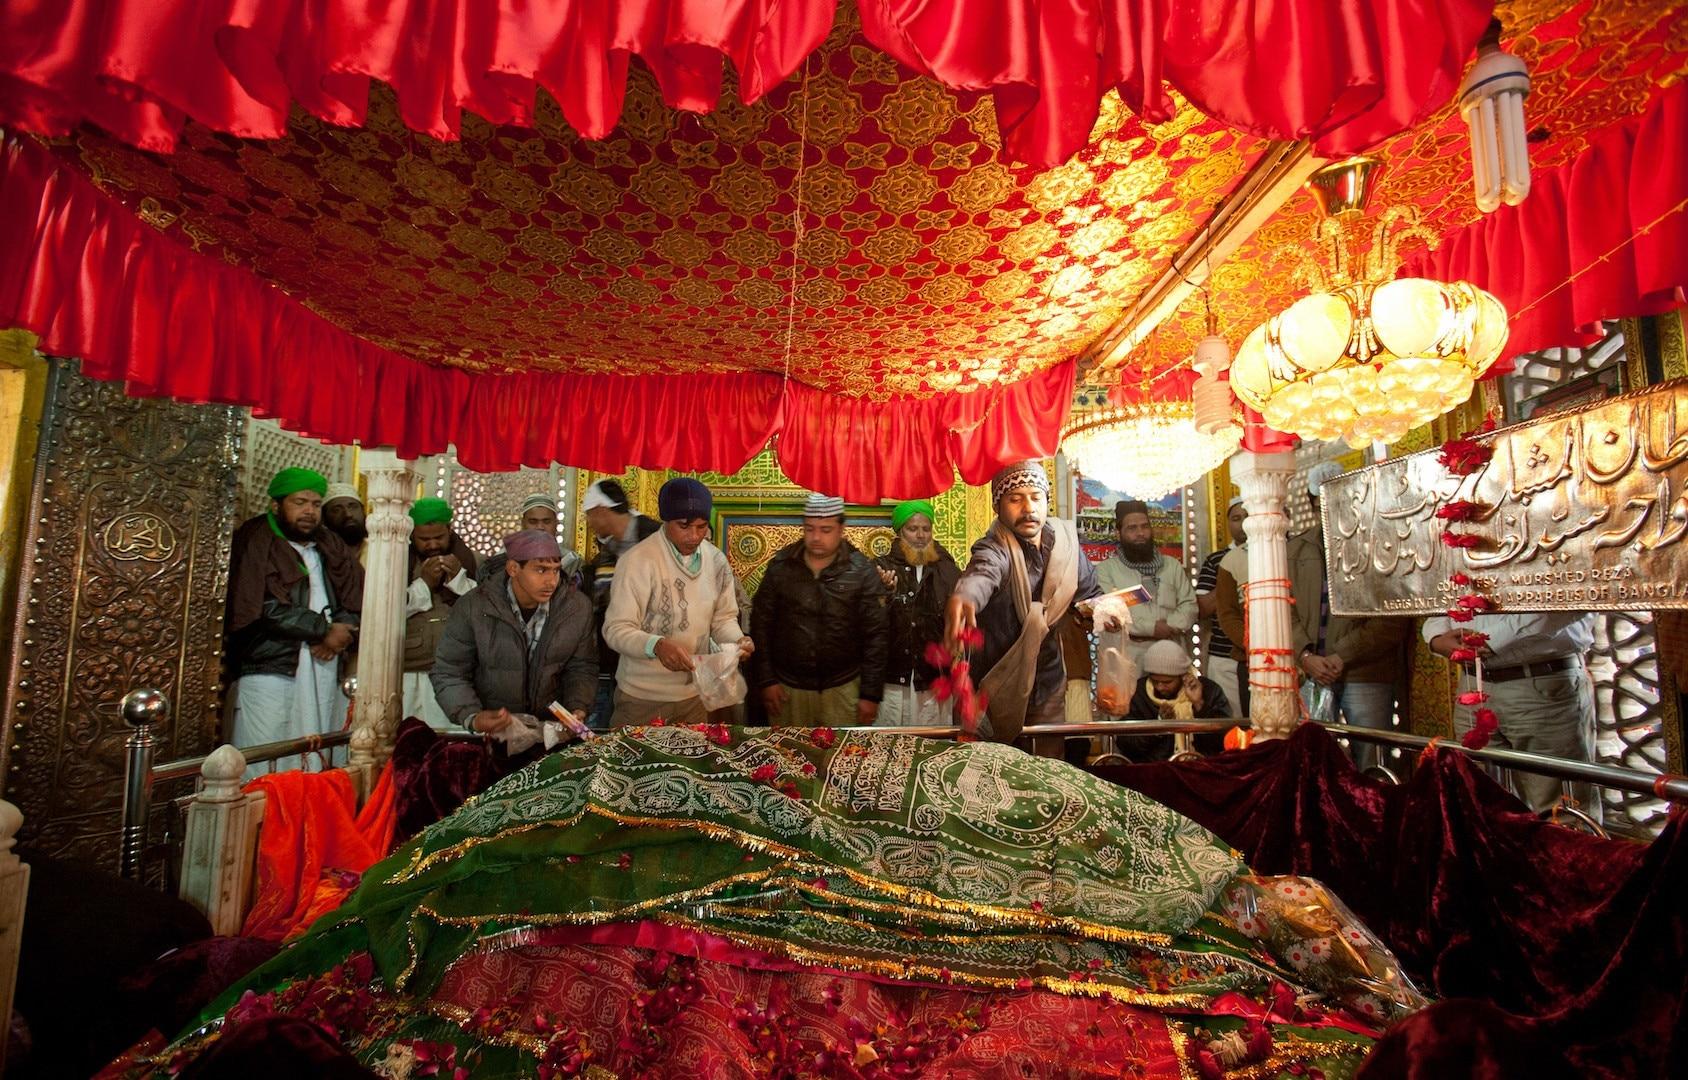 Nizamuddin Dargah, New Delhi, National Capital Territory of Delhi, India